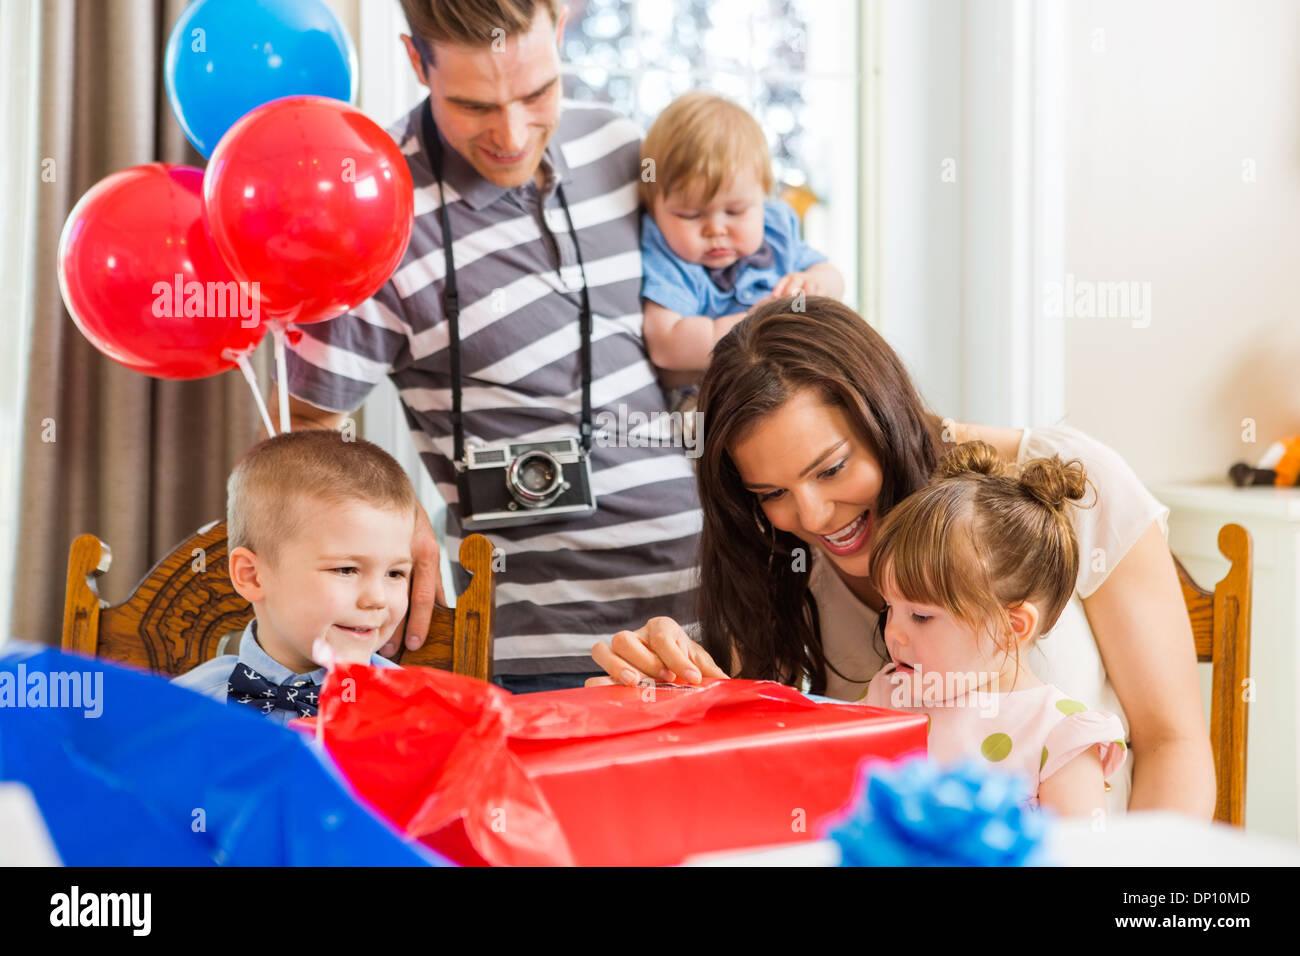 Apertura de la familia Cumpleaños en casa Imagen De Stock